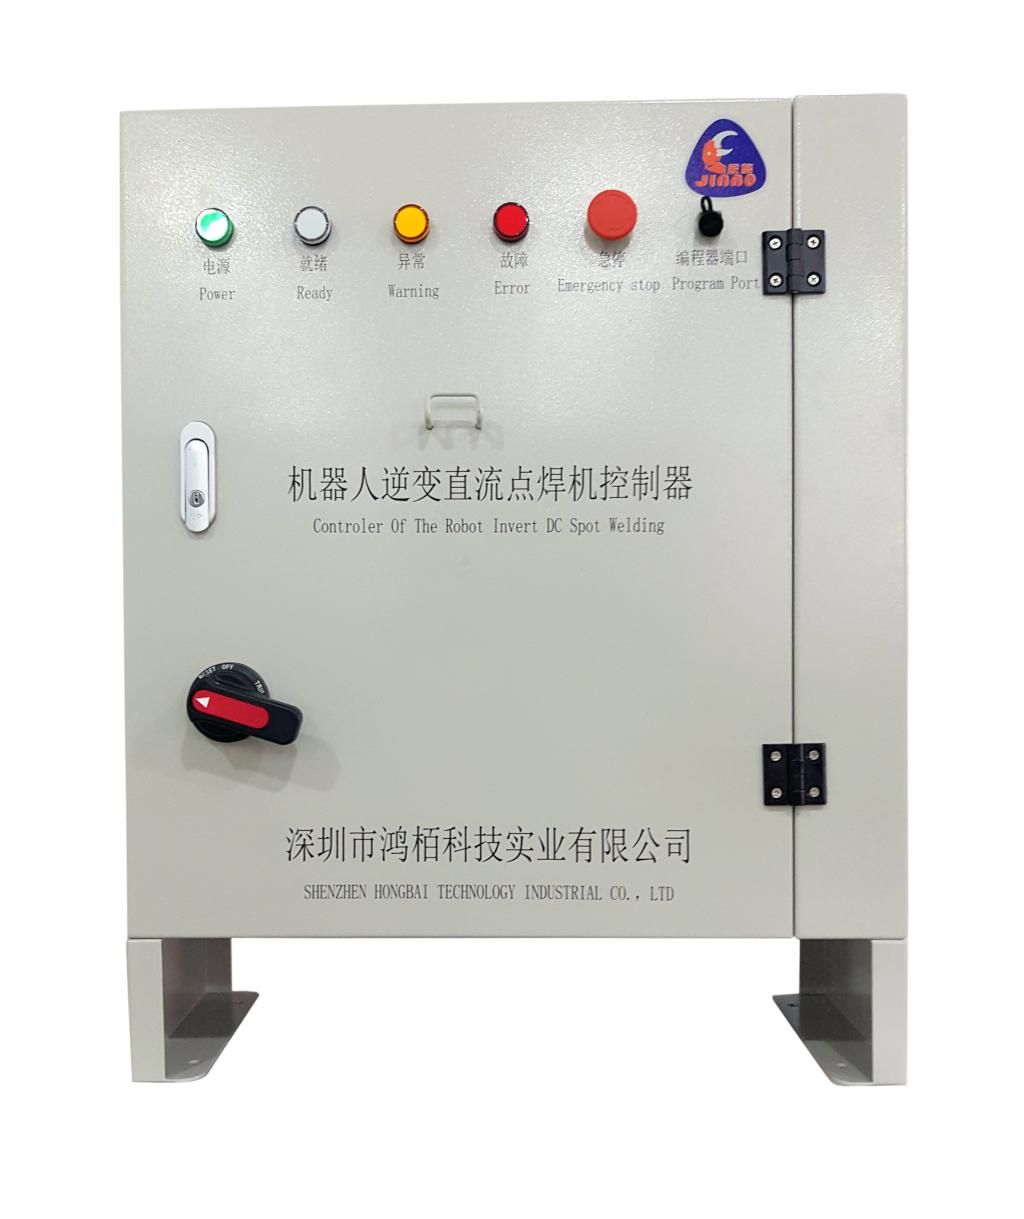 Usd 3542536 Intermediate Frequency Inverter Dc Robot Dedicated Welding Machine Diagram Electric Servo Spot Adaptive